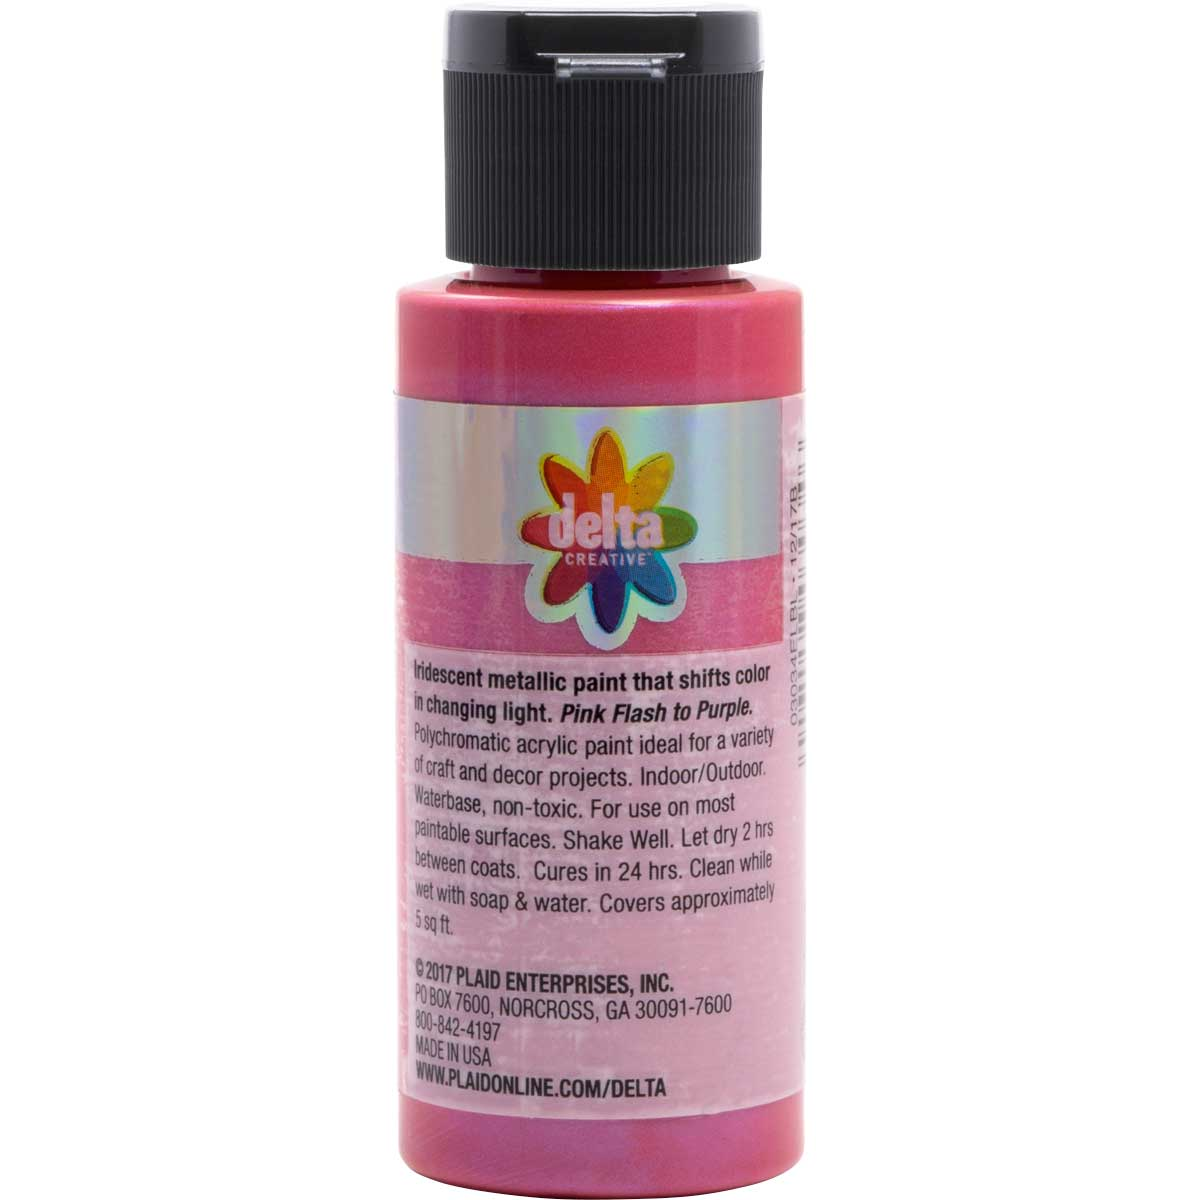 Delta Ceramcoat ® Acrylic Paint - Flash Metallic Pink, 2 oz. - 03034